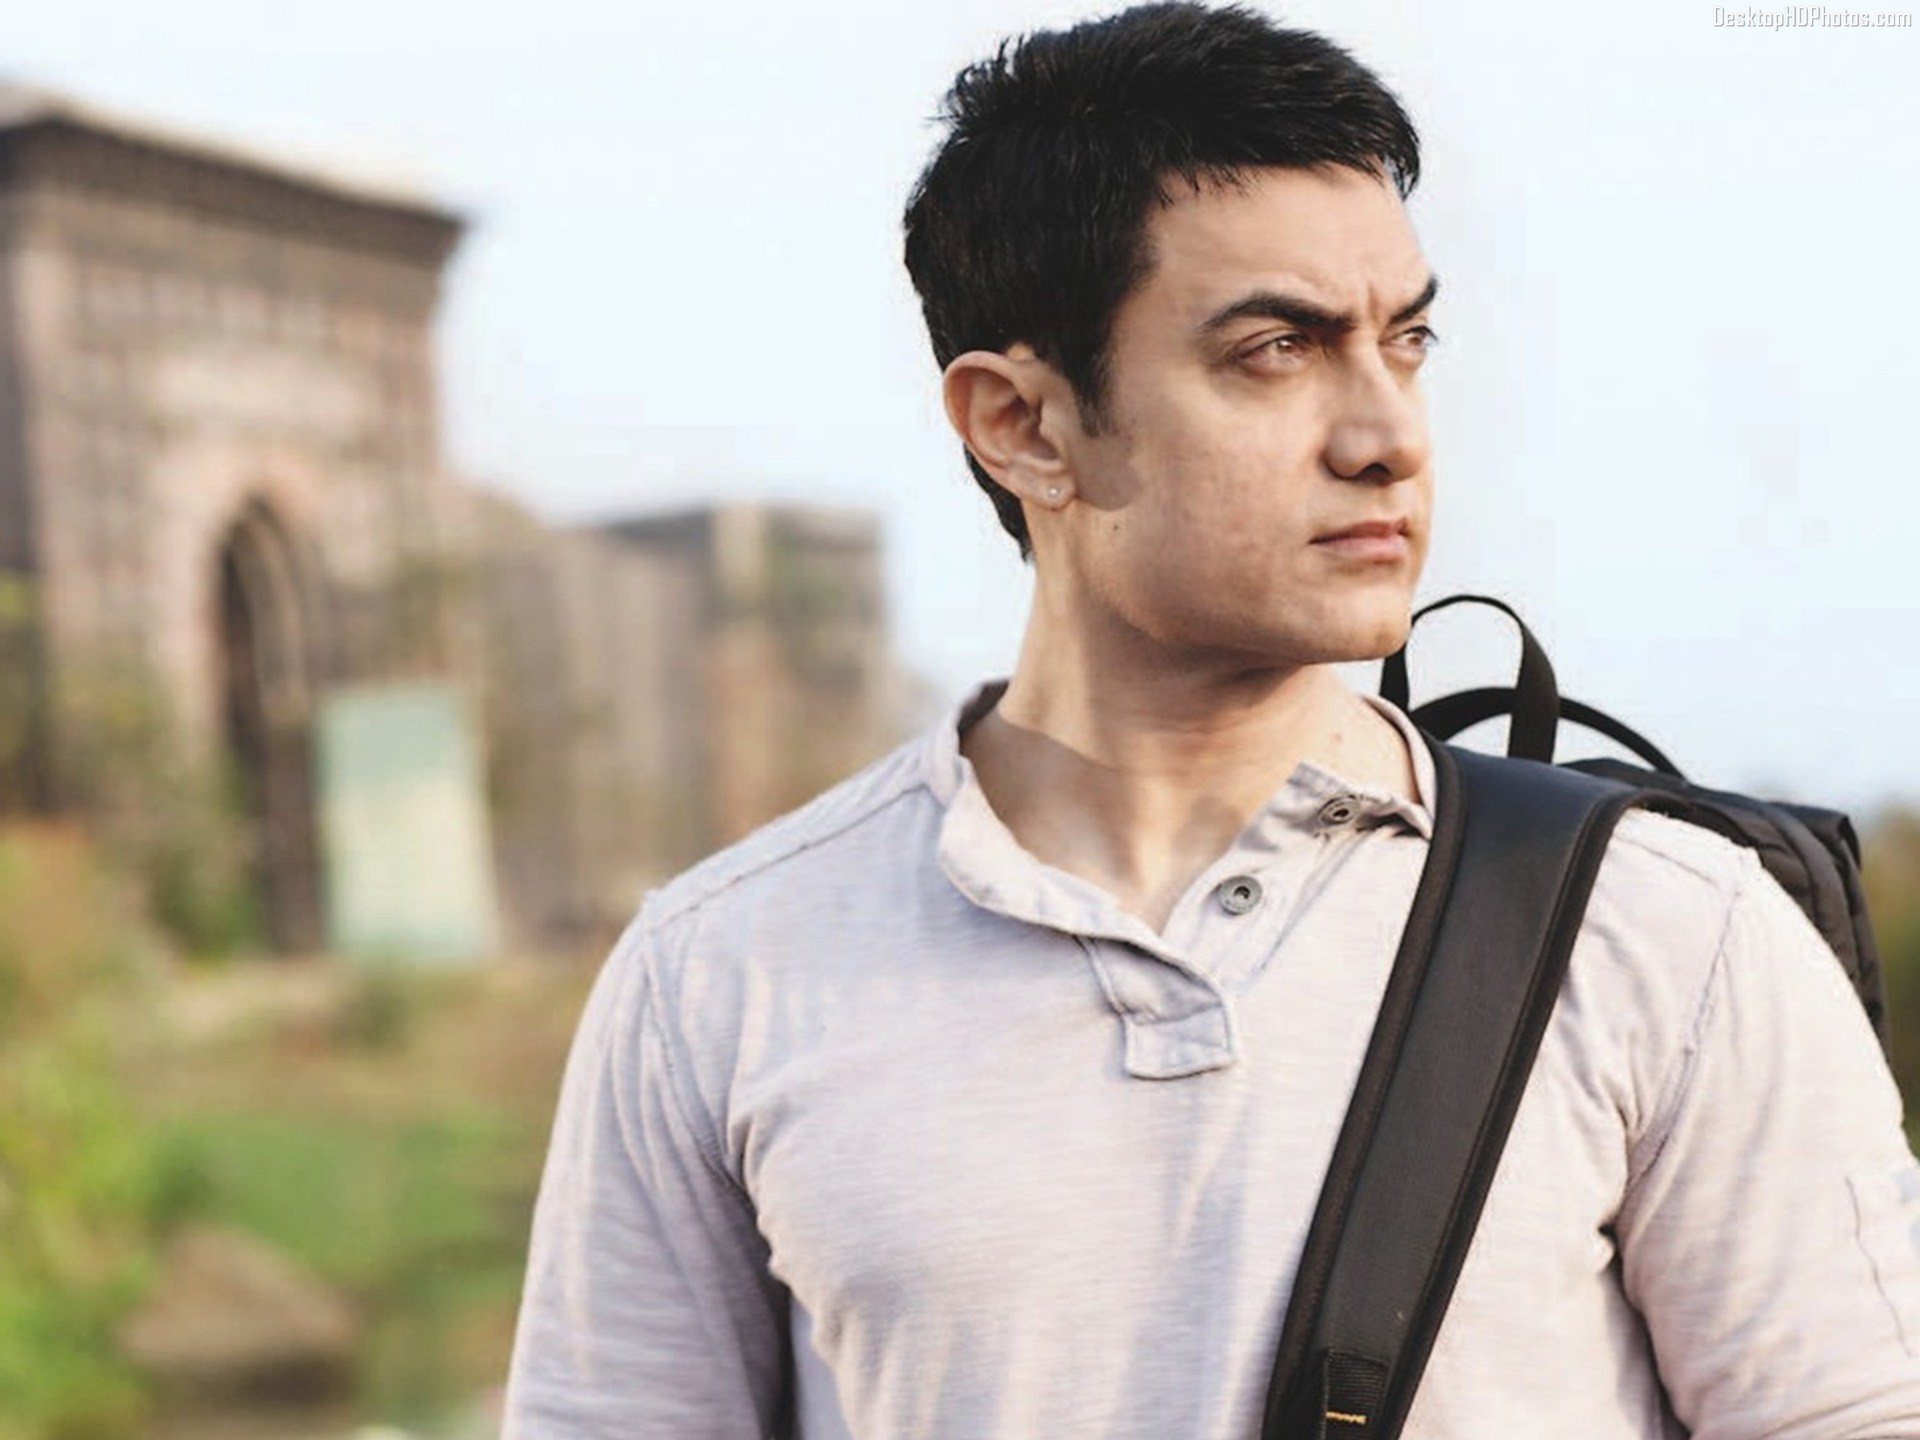 Aamir Khan Wallpapers HD Backgrounds Images Pics Photos 1920x1440